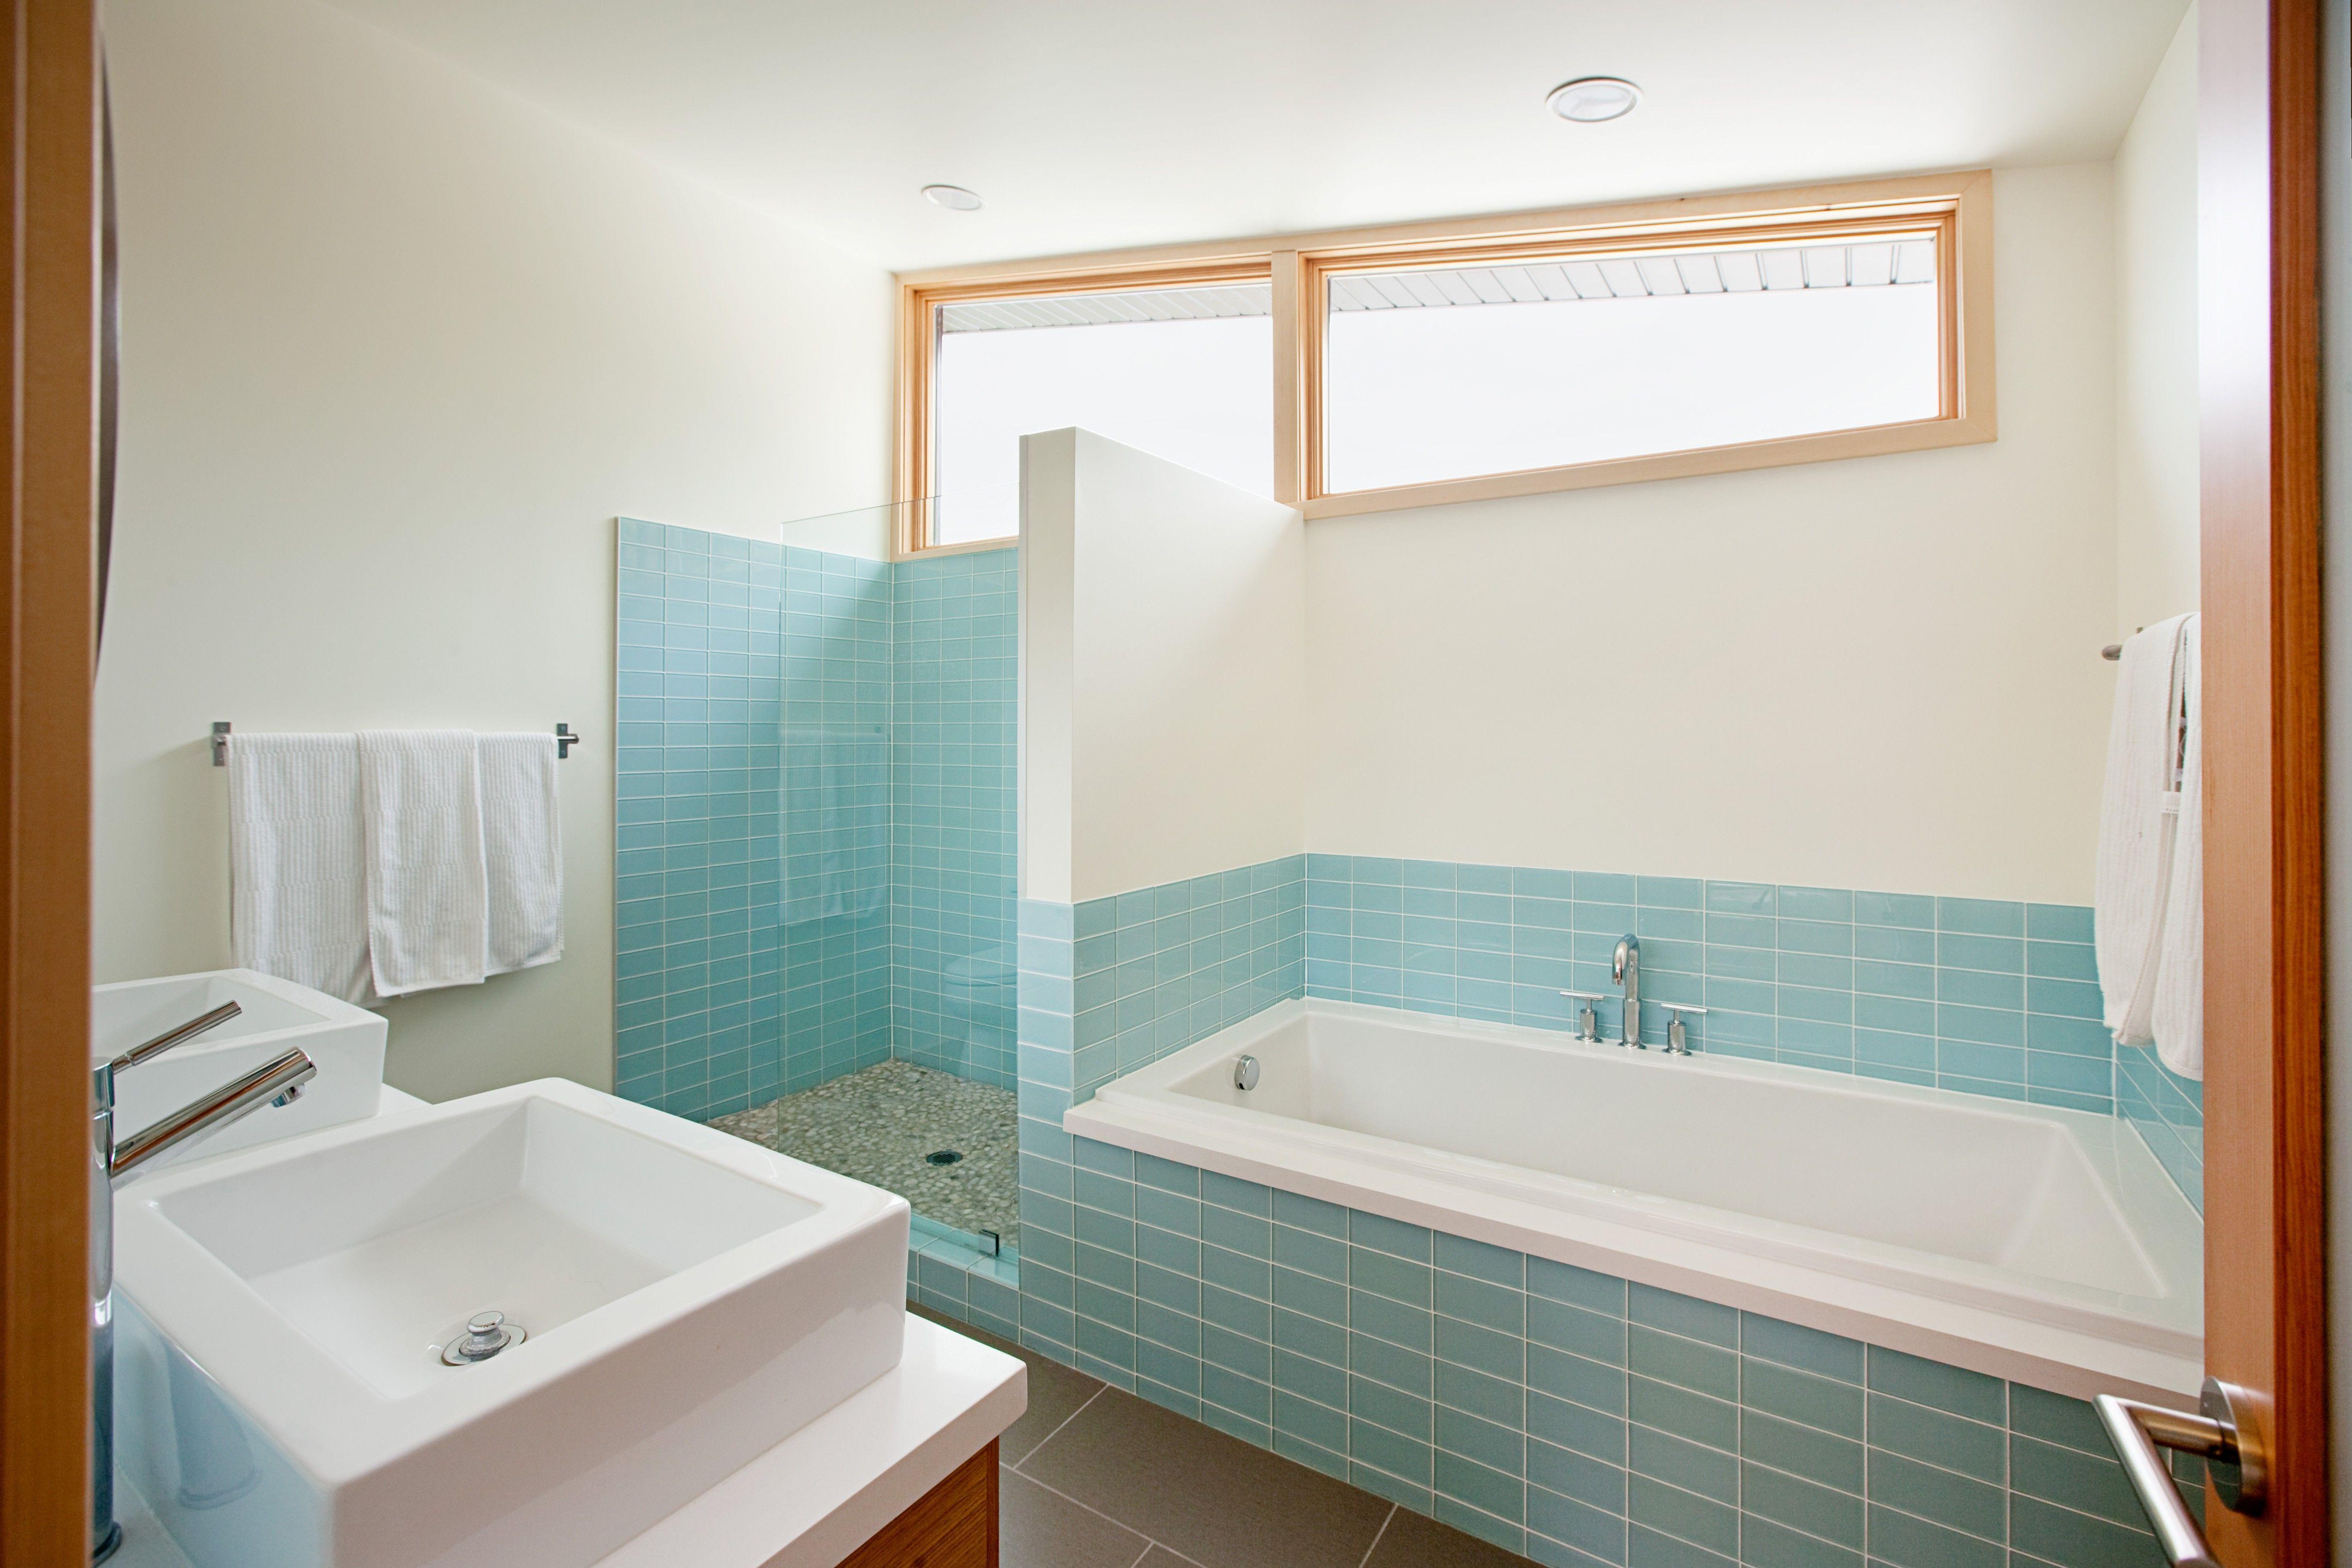 Modwalls Lush 3x6 Vapor pale blue glass subway tile master bath.by ...